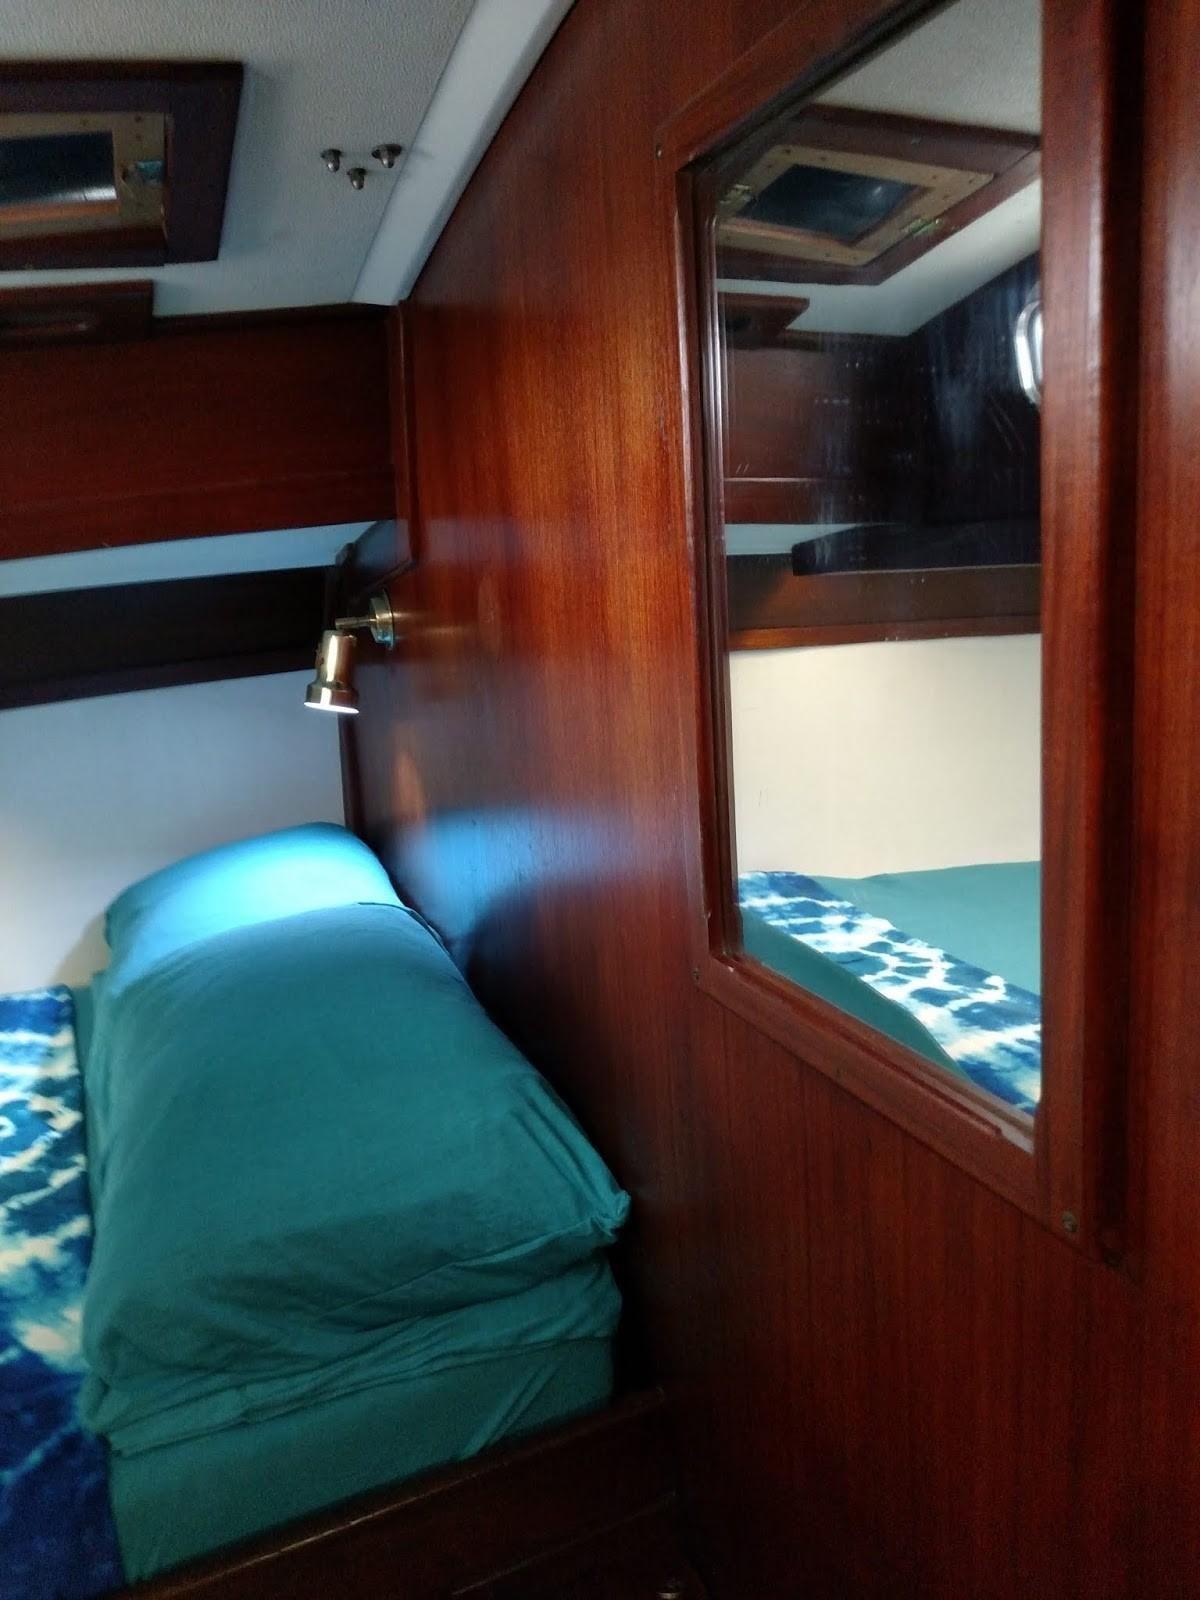 1982 Used Tartan 42 Sloop Sailboat For Sale - $64,900